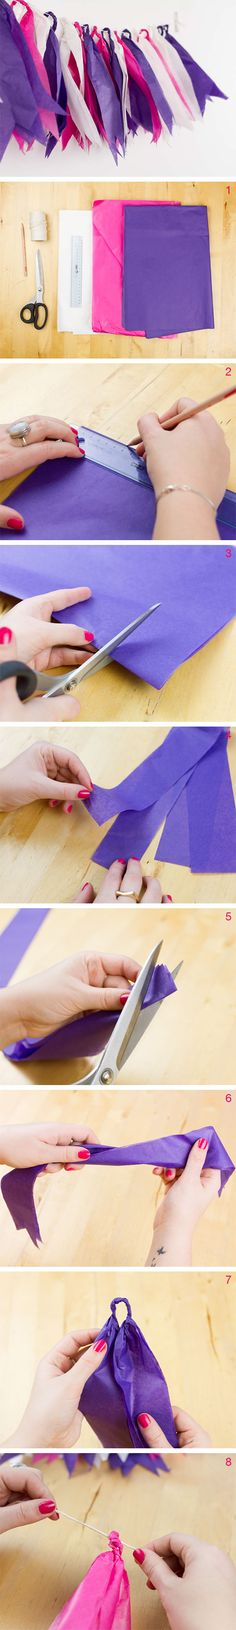 DIY kostenlose Anleitung: Seidenpapier-Girlande, Party Deko, Feste feiern // DIY free tutorial: wrapping tissue garland, party decoration via DaWanda.com